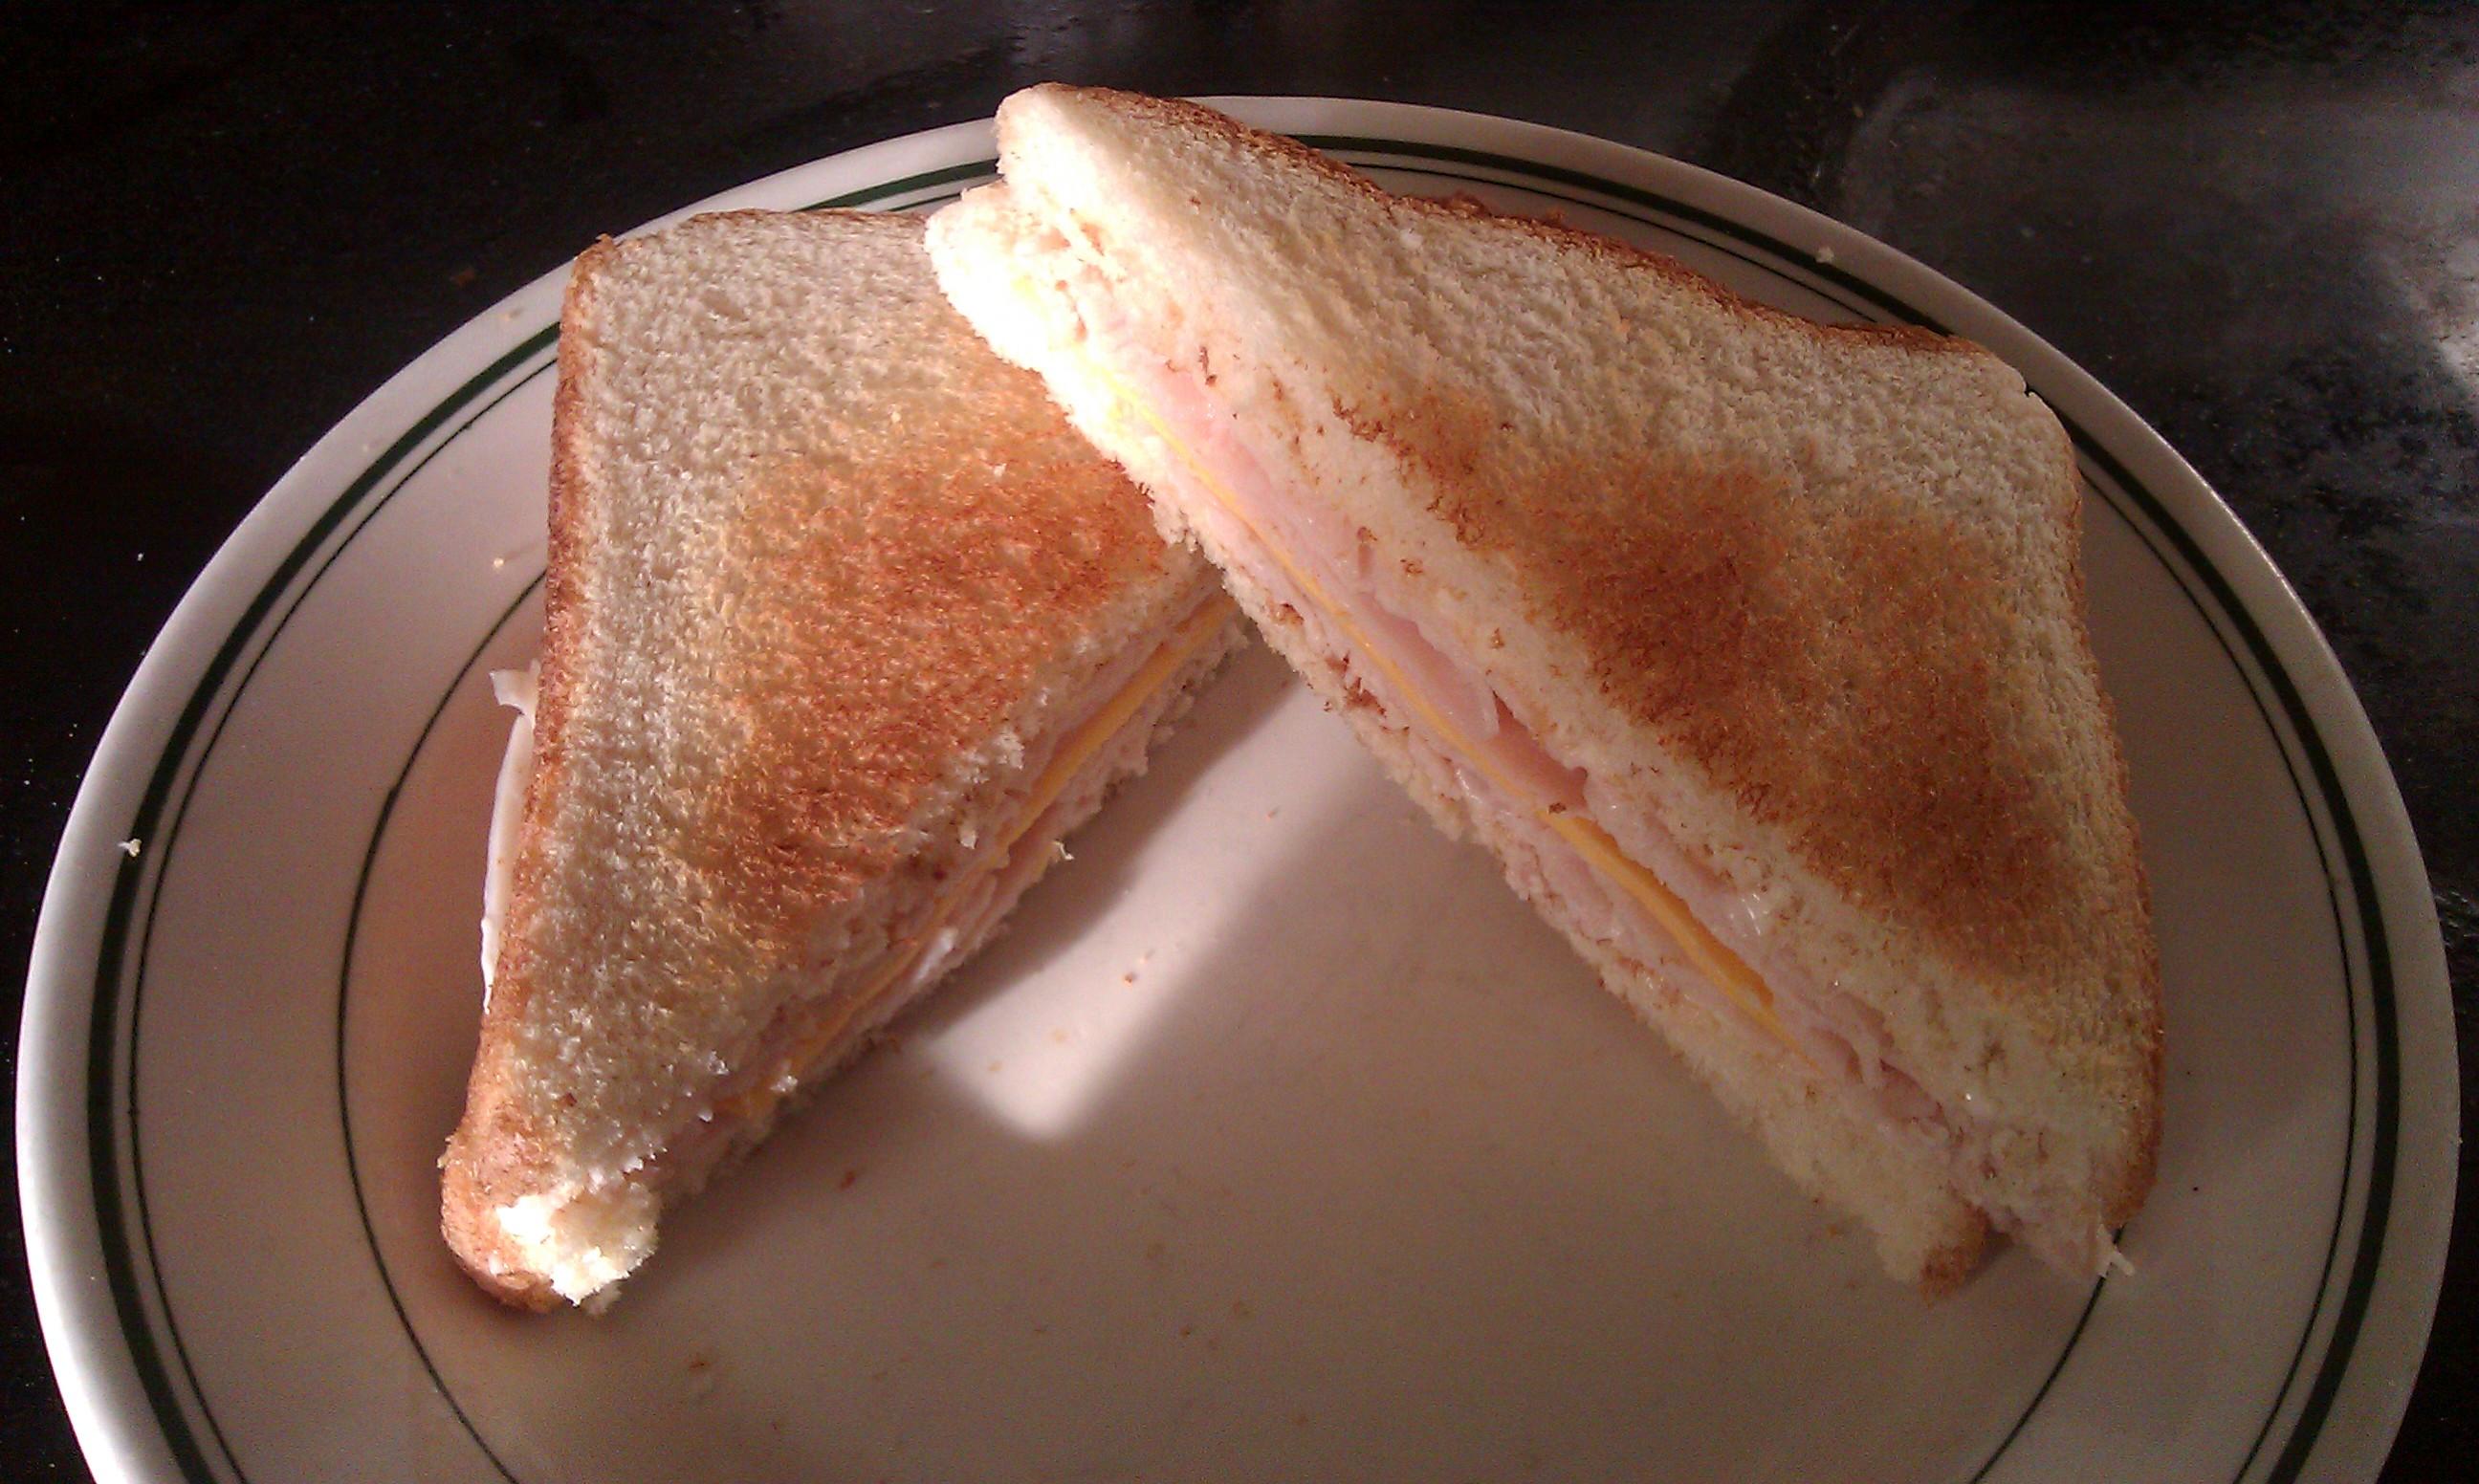 https://foodloader.net/t0xik_2012-08-01_turkey_and_cheese_sammich.jpg